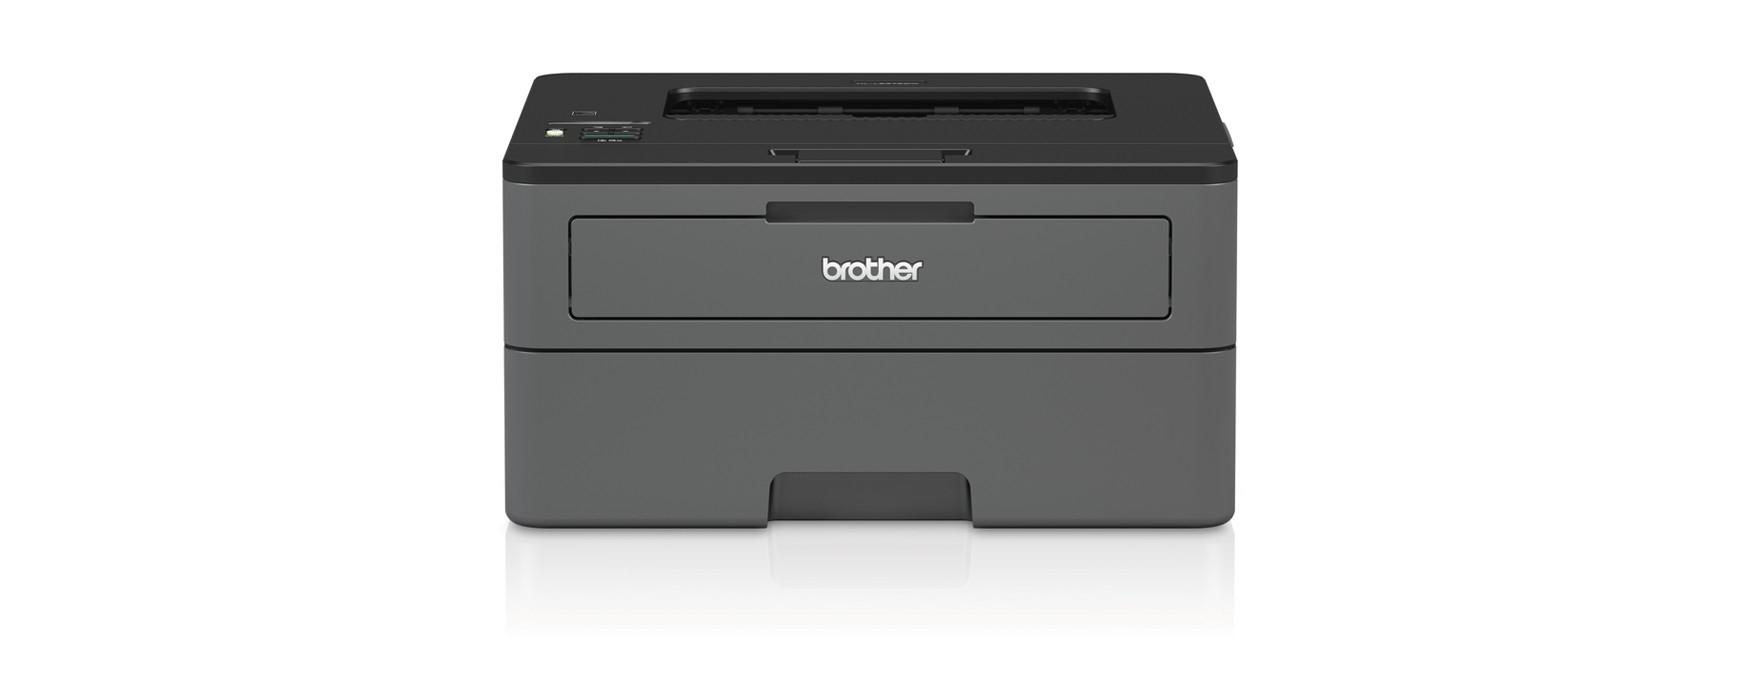 Brother HL-L2375DW Toner Cartridge